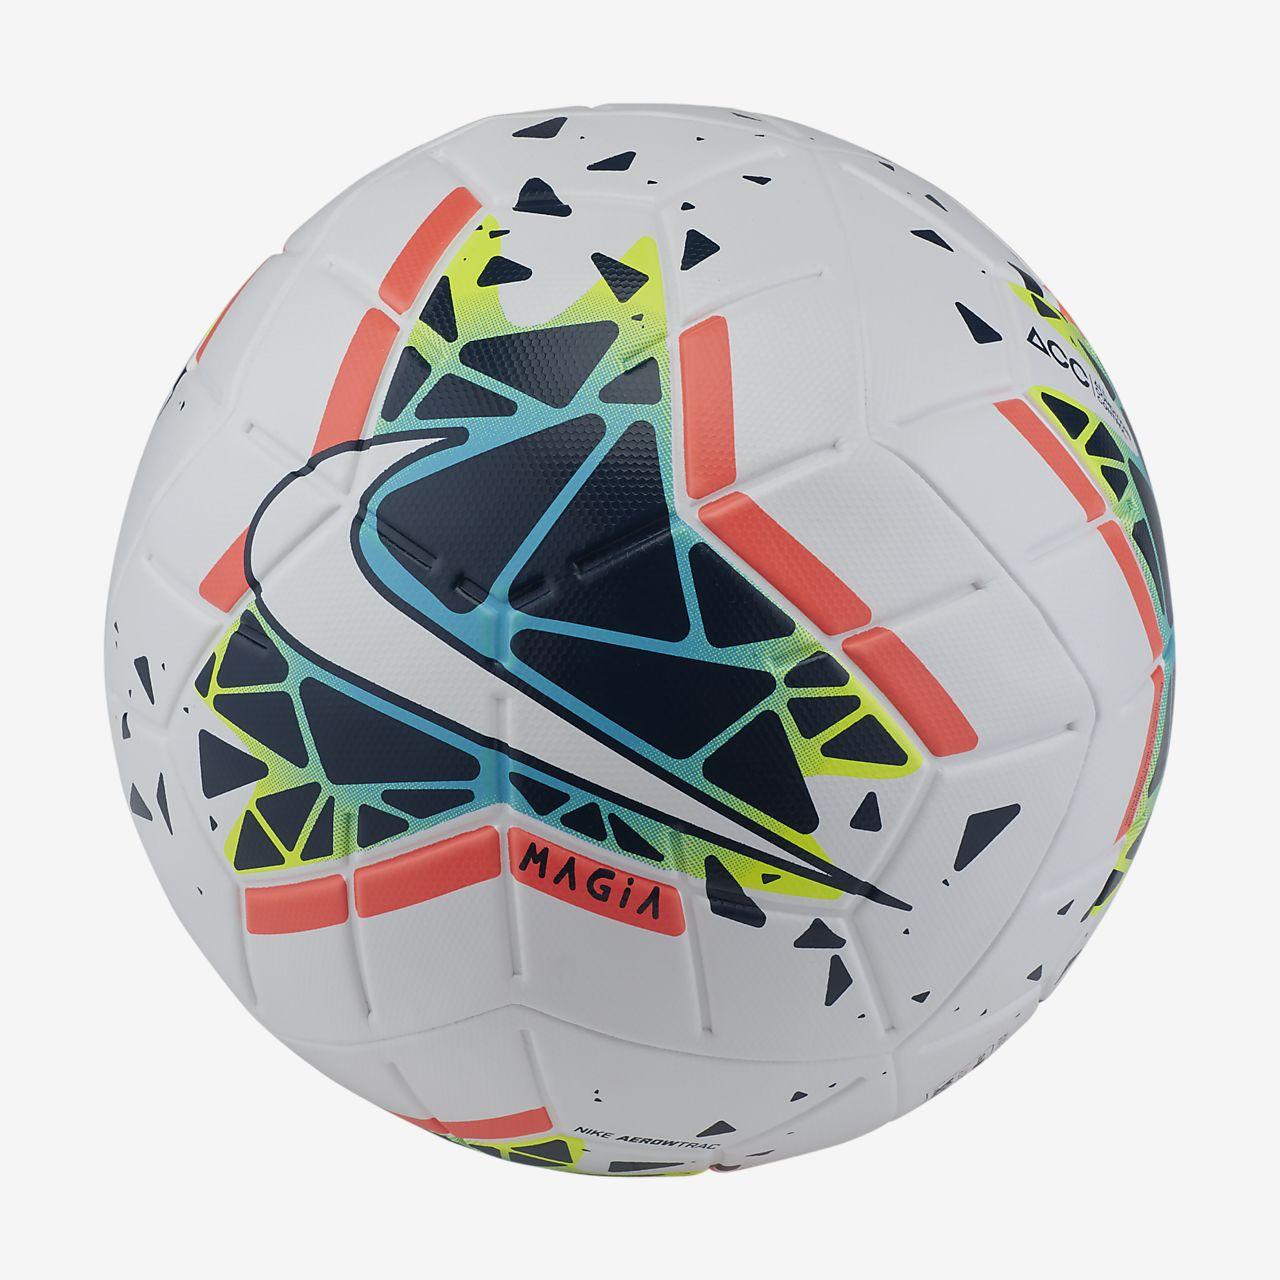 Nike Magia Football